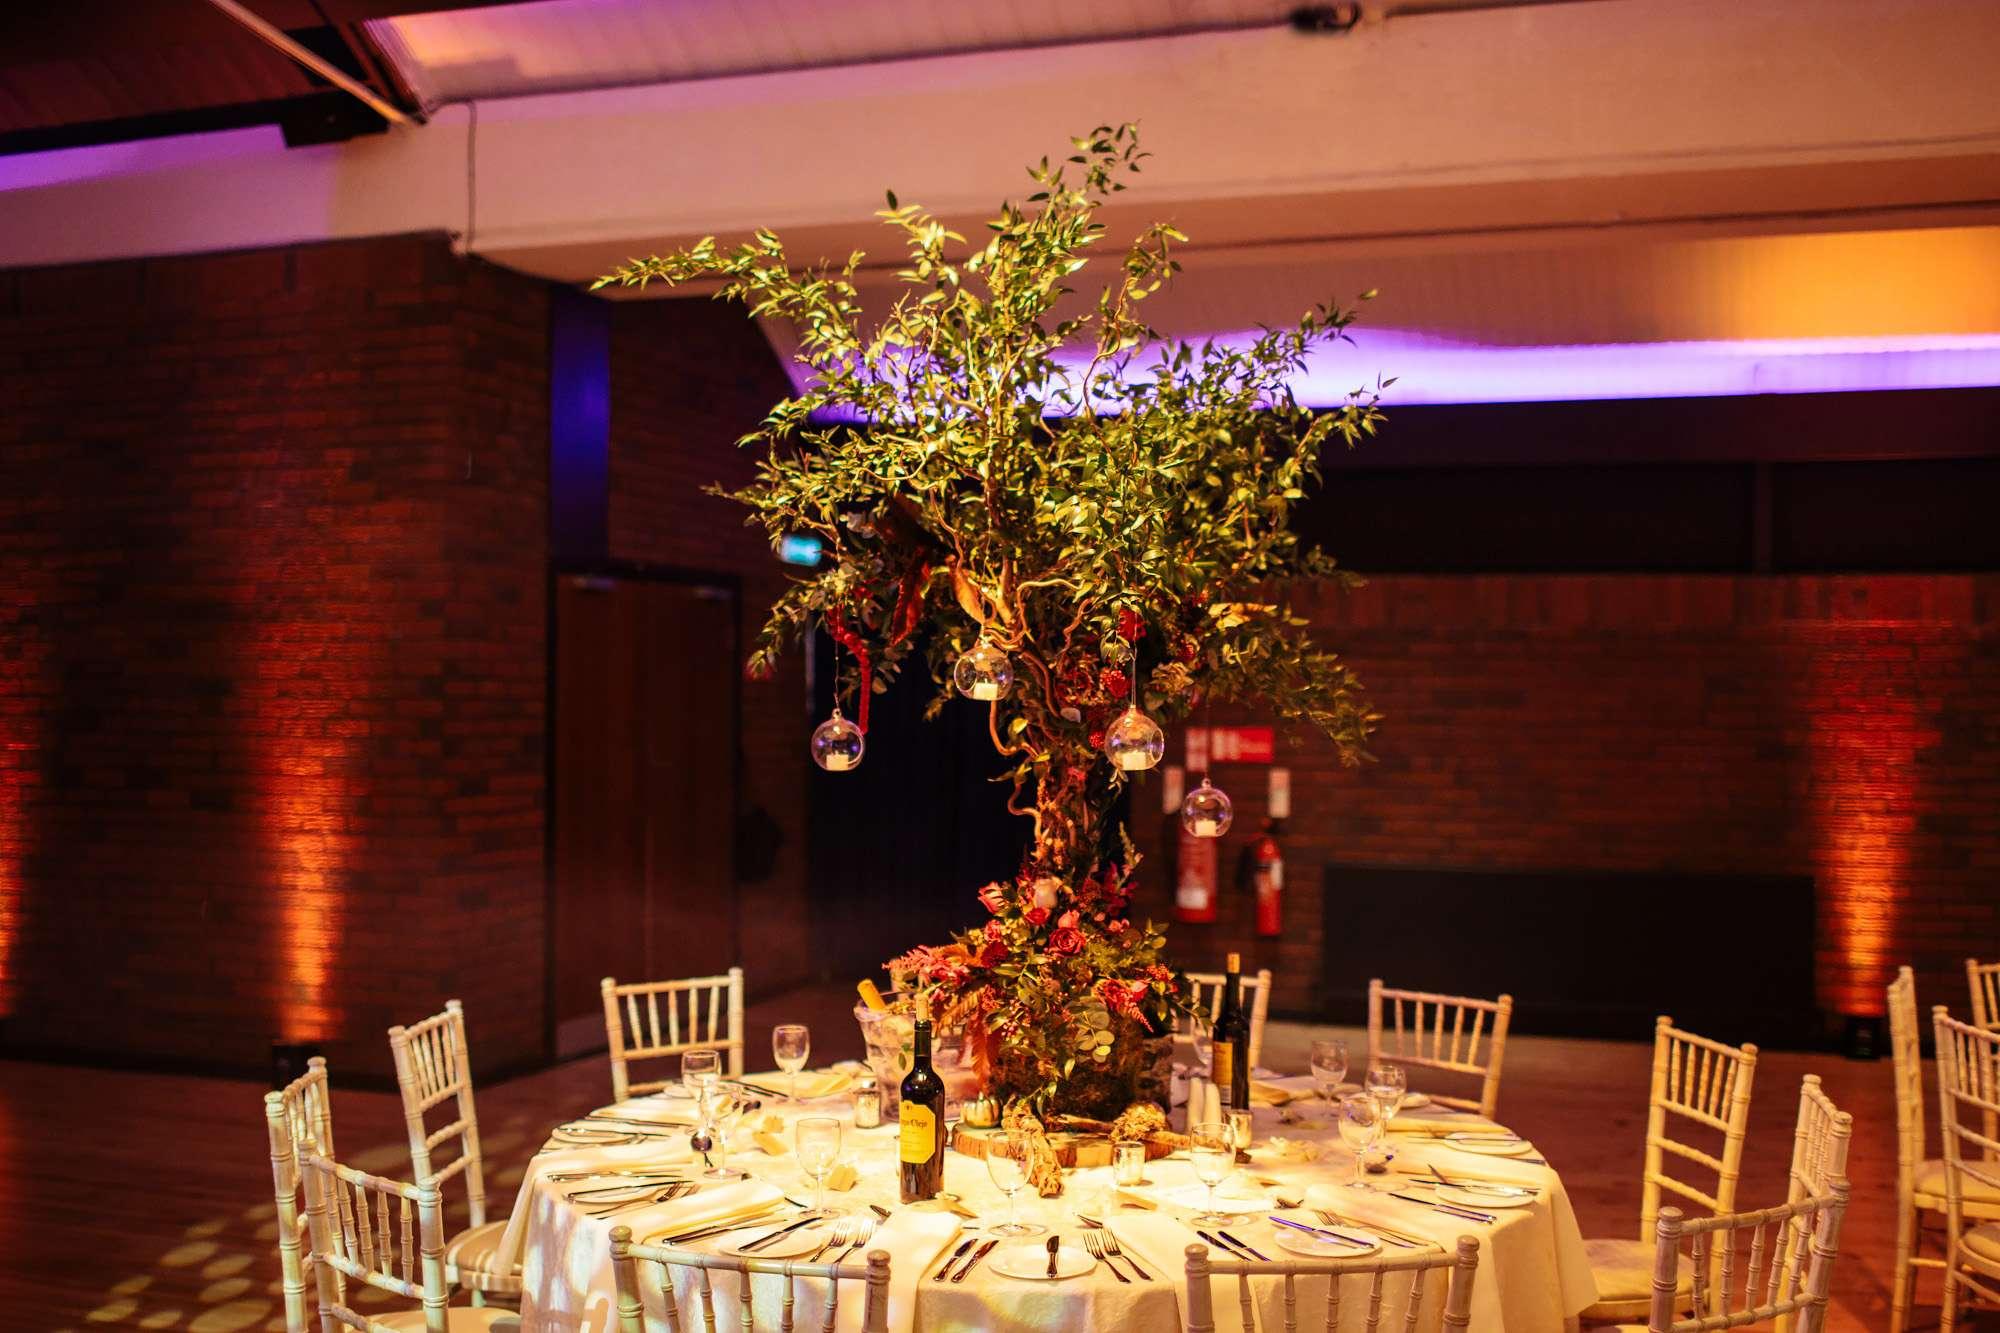 Table centrepieces at a wedding